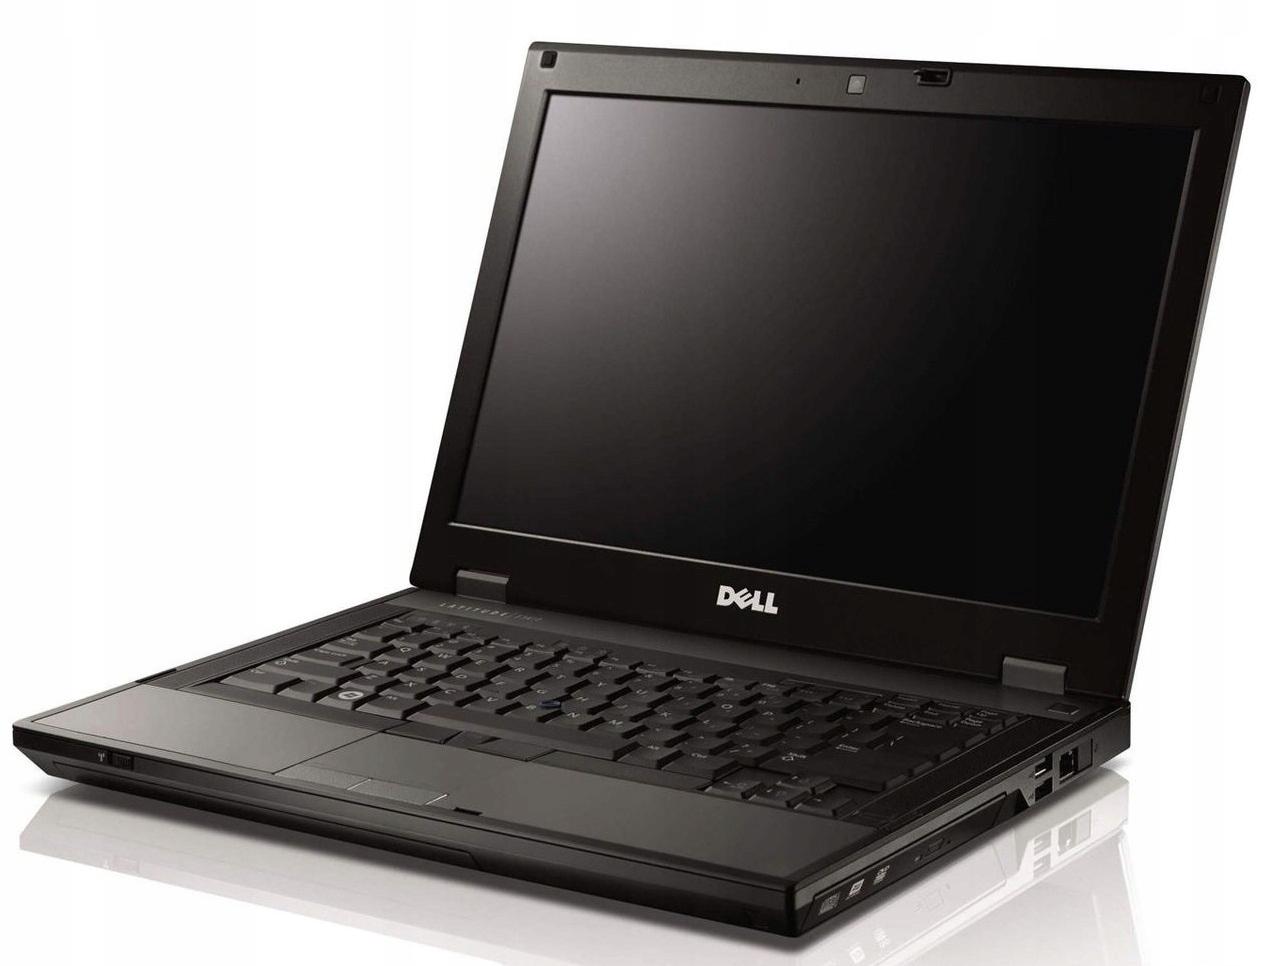 BATERIA AKUMULATOR DELL KM742 0KM742 PP32L - Baterie do laptopów